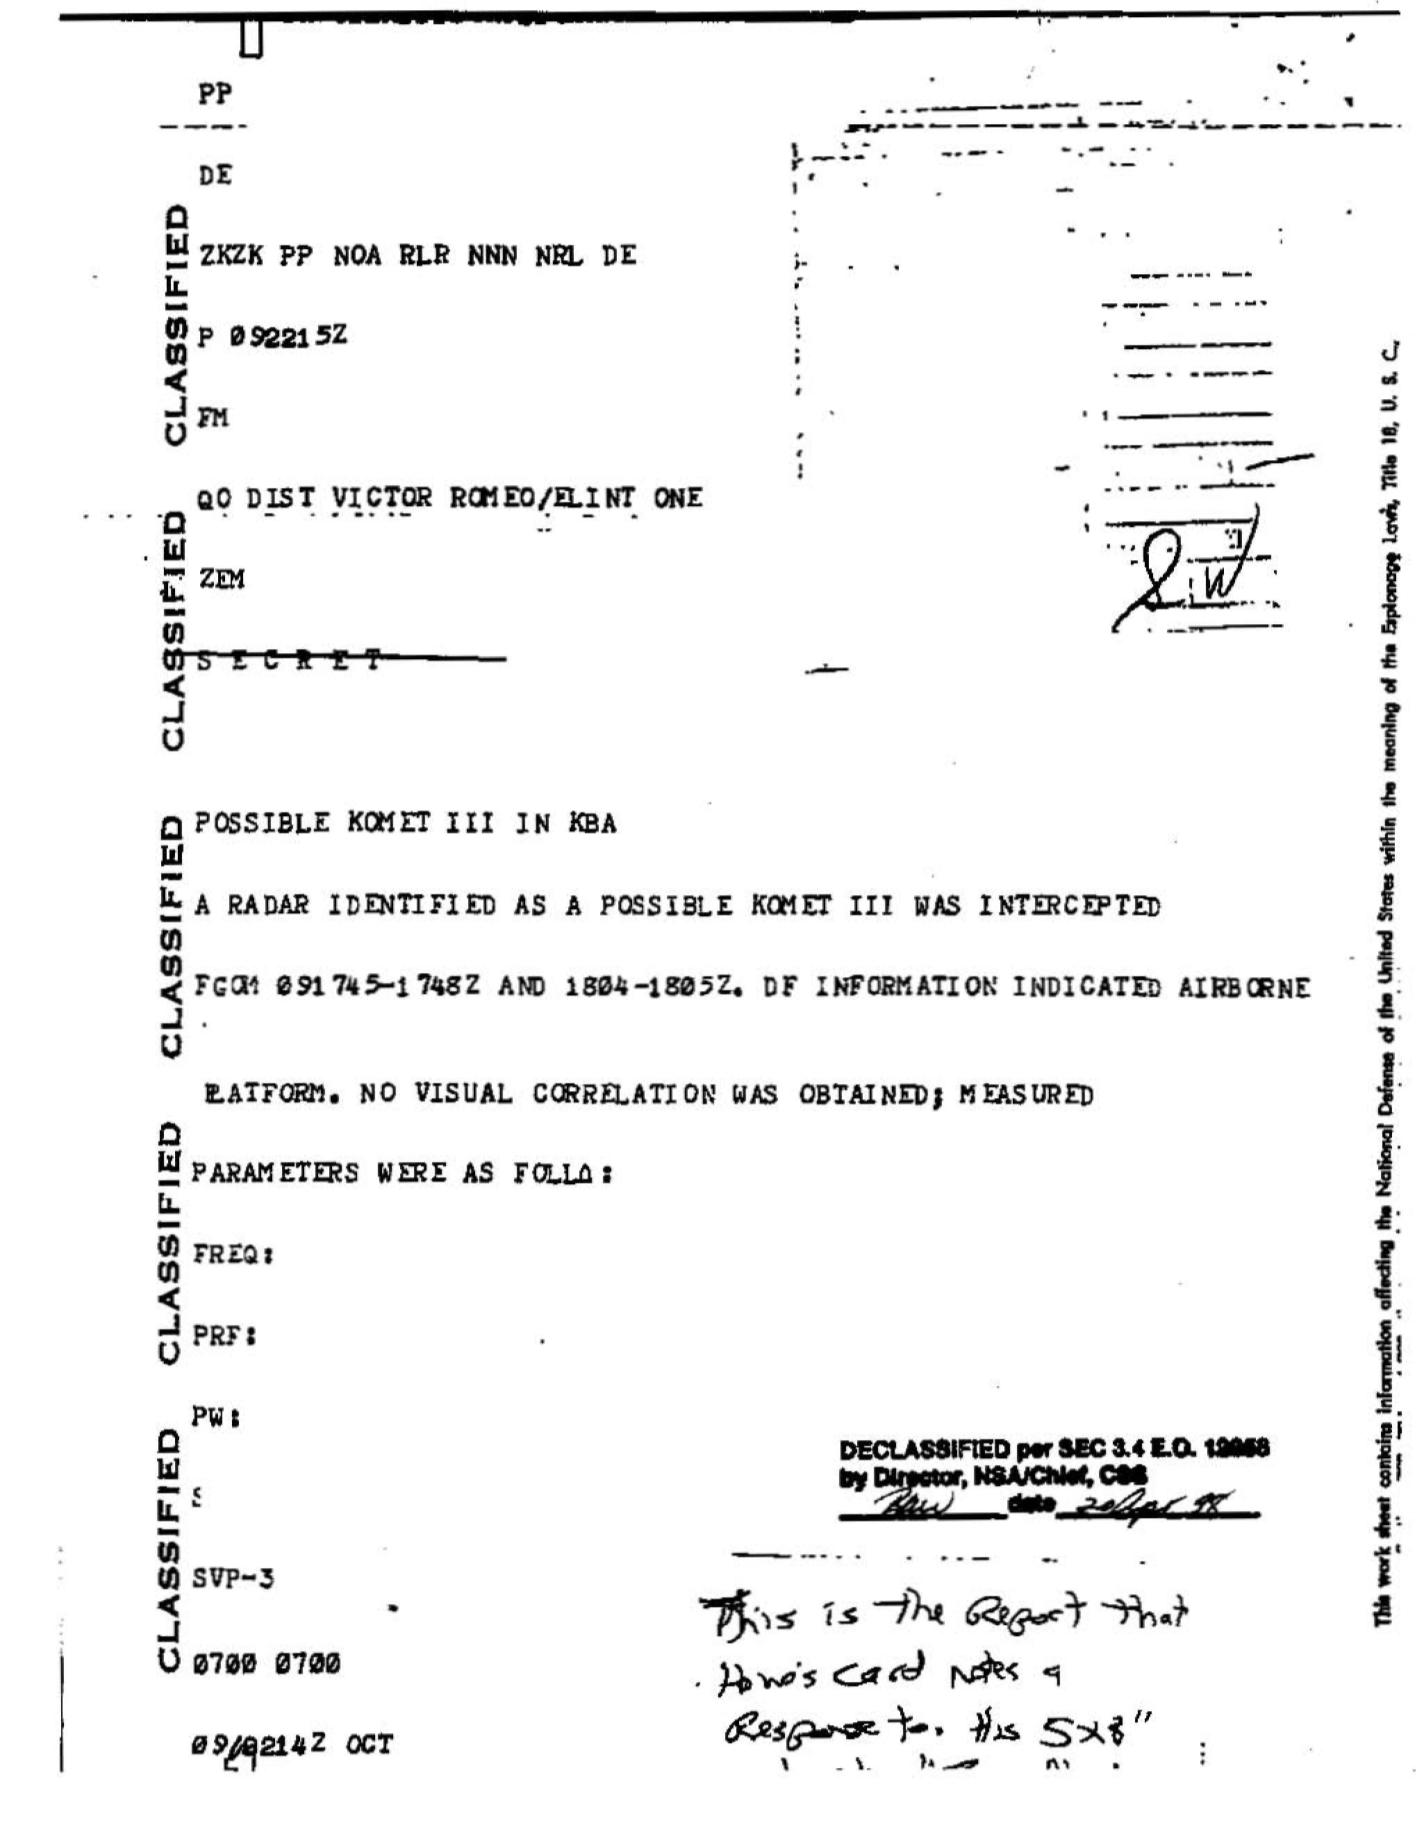 9_OCTOBER_DIRNSA_MESSAGE.PDF